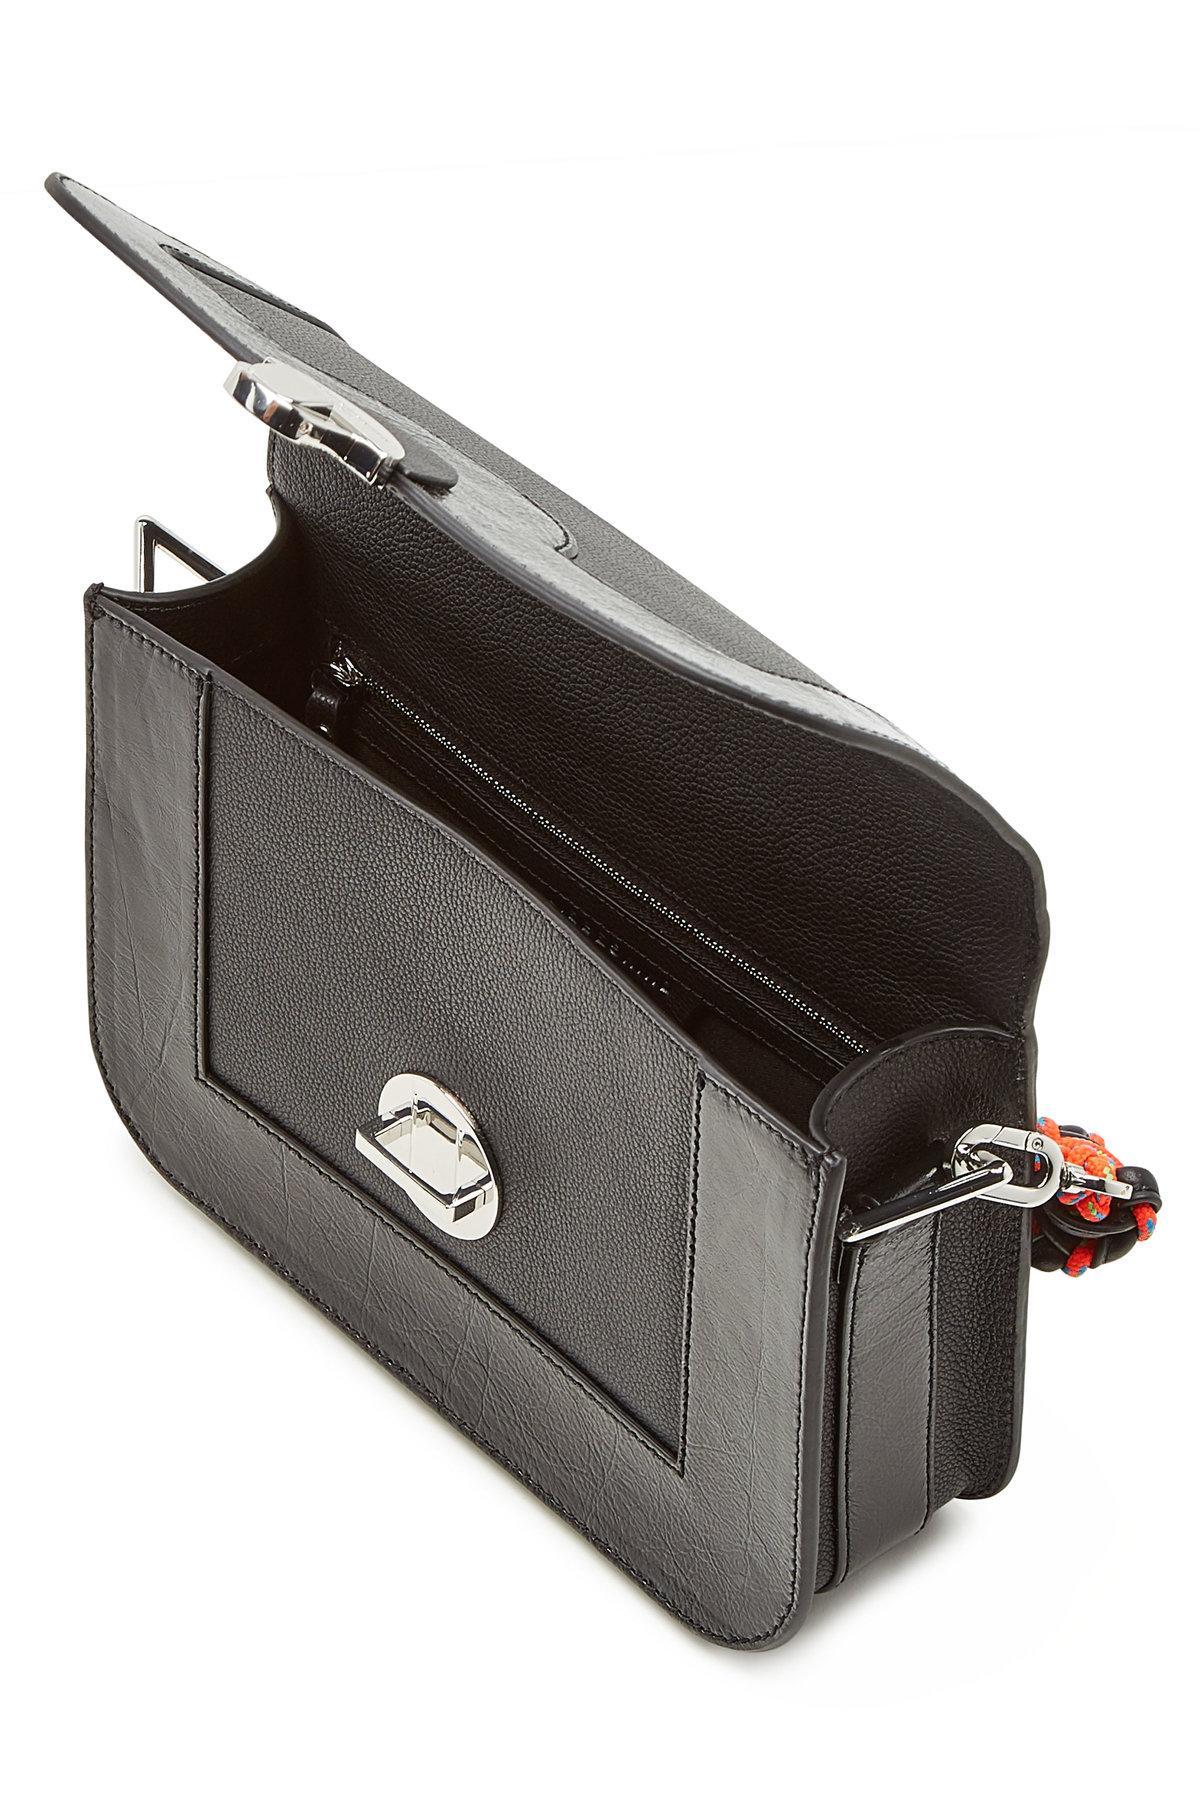 e7ae16f02 Liebeskind Berlin - Black Clasp M Leather Crossbody Bag - Lyst. View  fullscreen